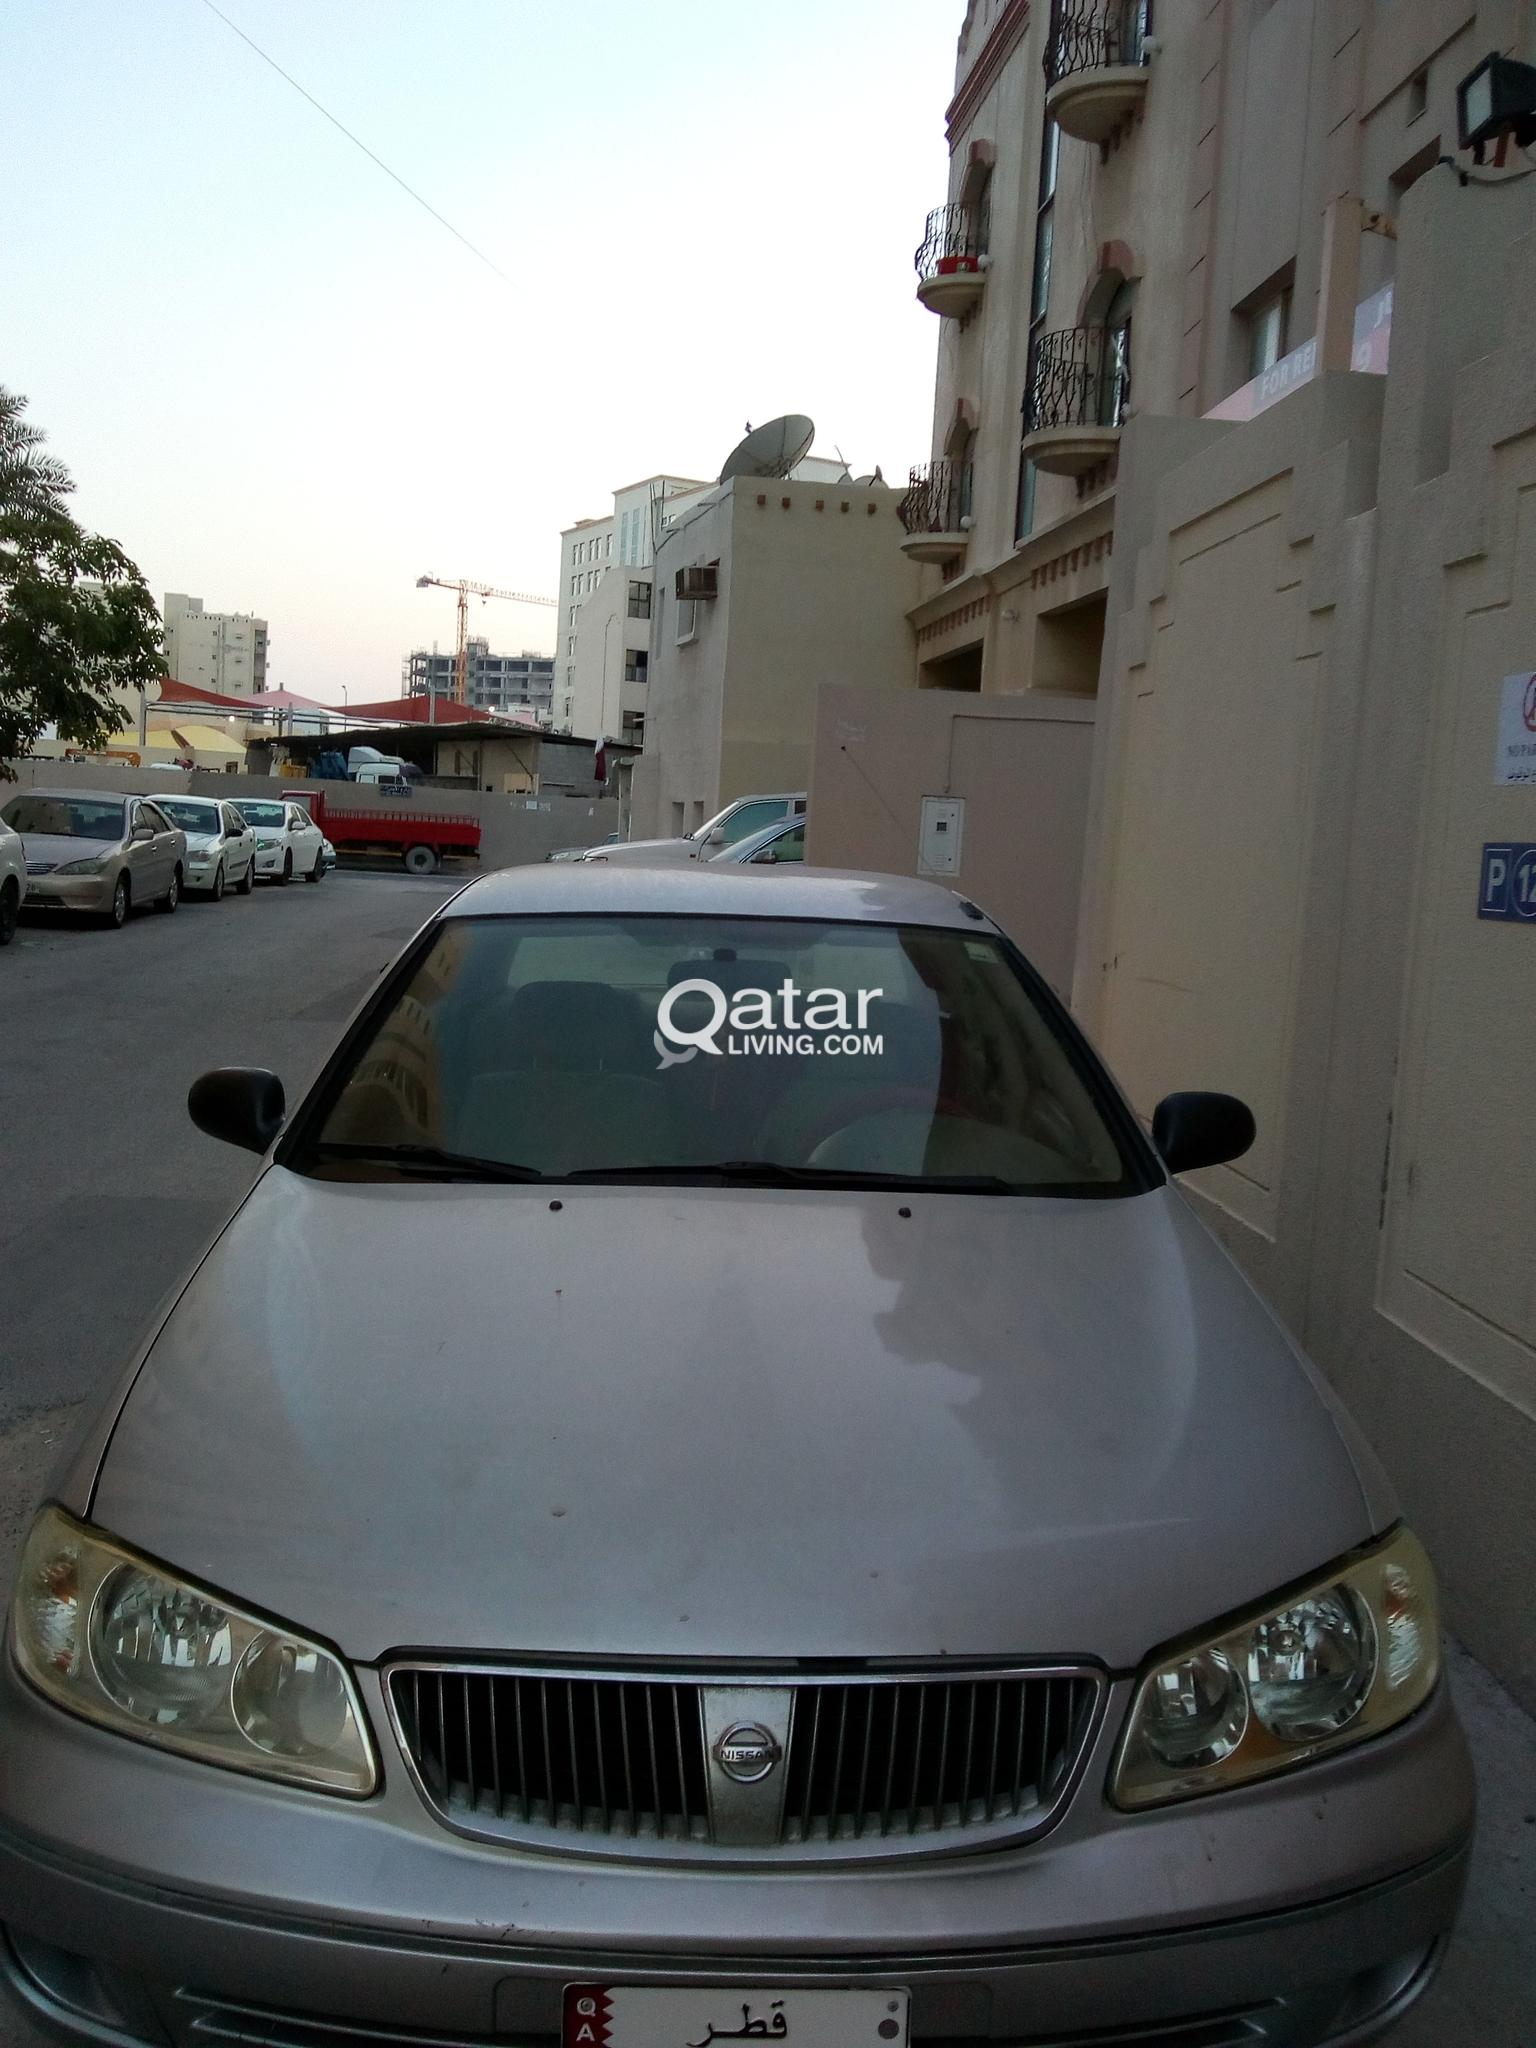 Nissan Sunny Sale 2005 Qr 8000 Qatar Living